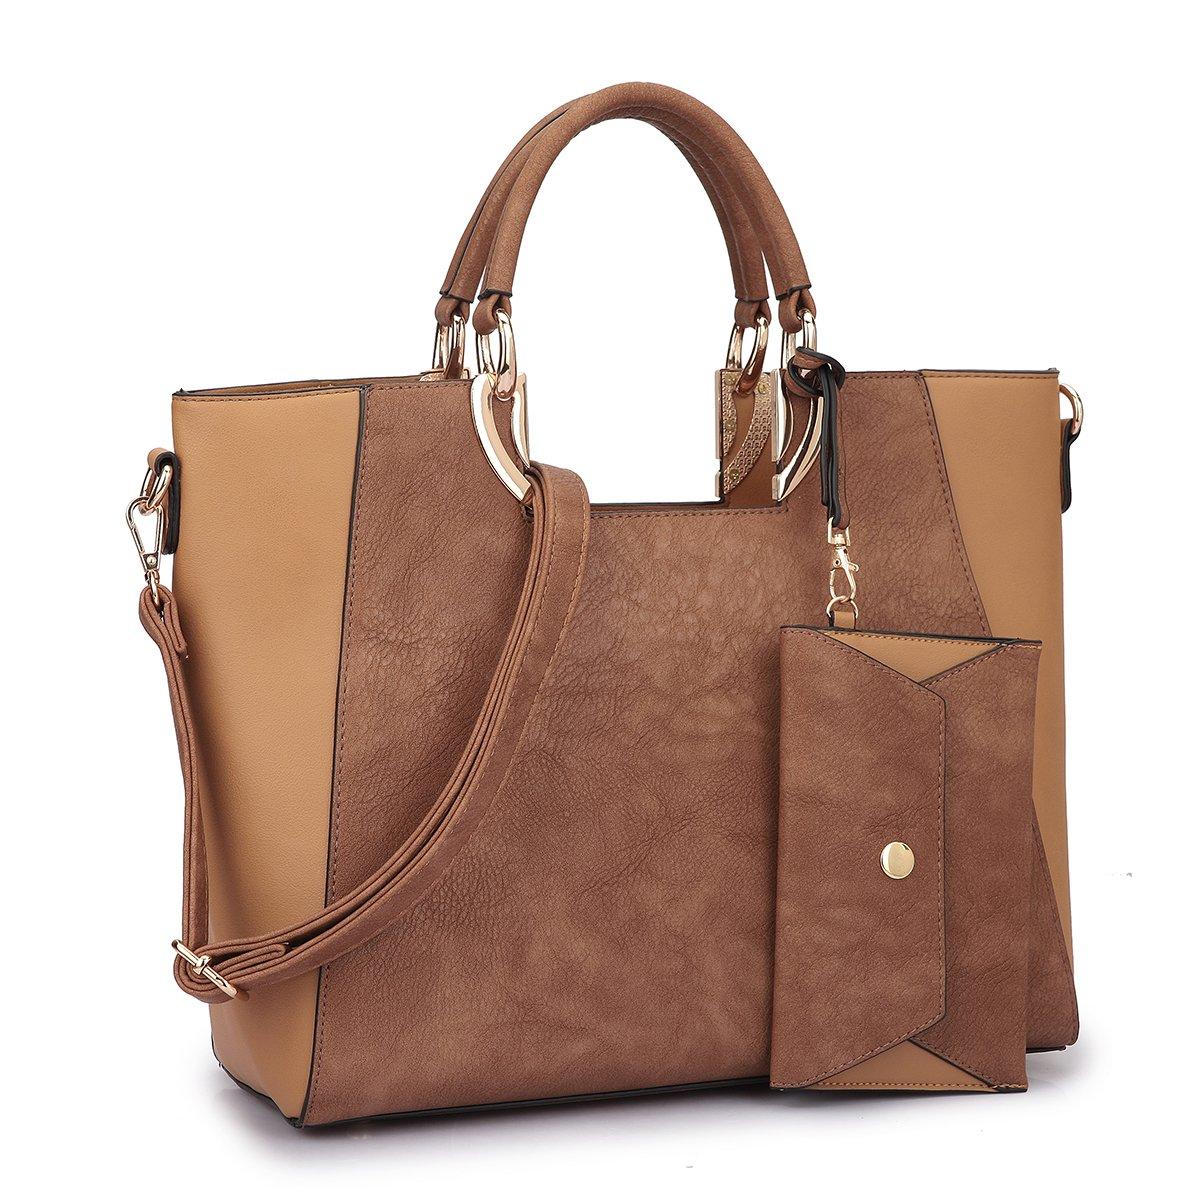 1eb4c4a68a3 Amazon.com  MMK collection Fashion Handbag with coin purse Classic Women  Purse Handbag for Women` Signature fashion Designer Satchel Purse ~  Beautiful ...